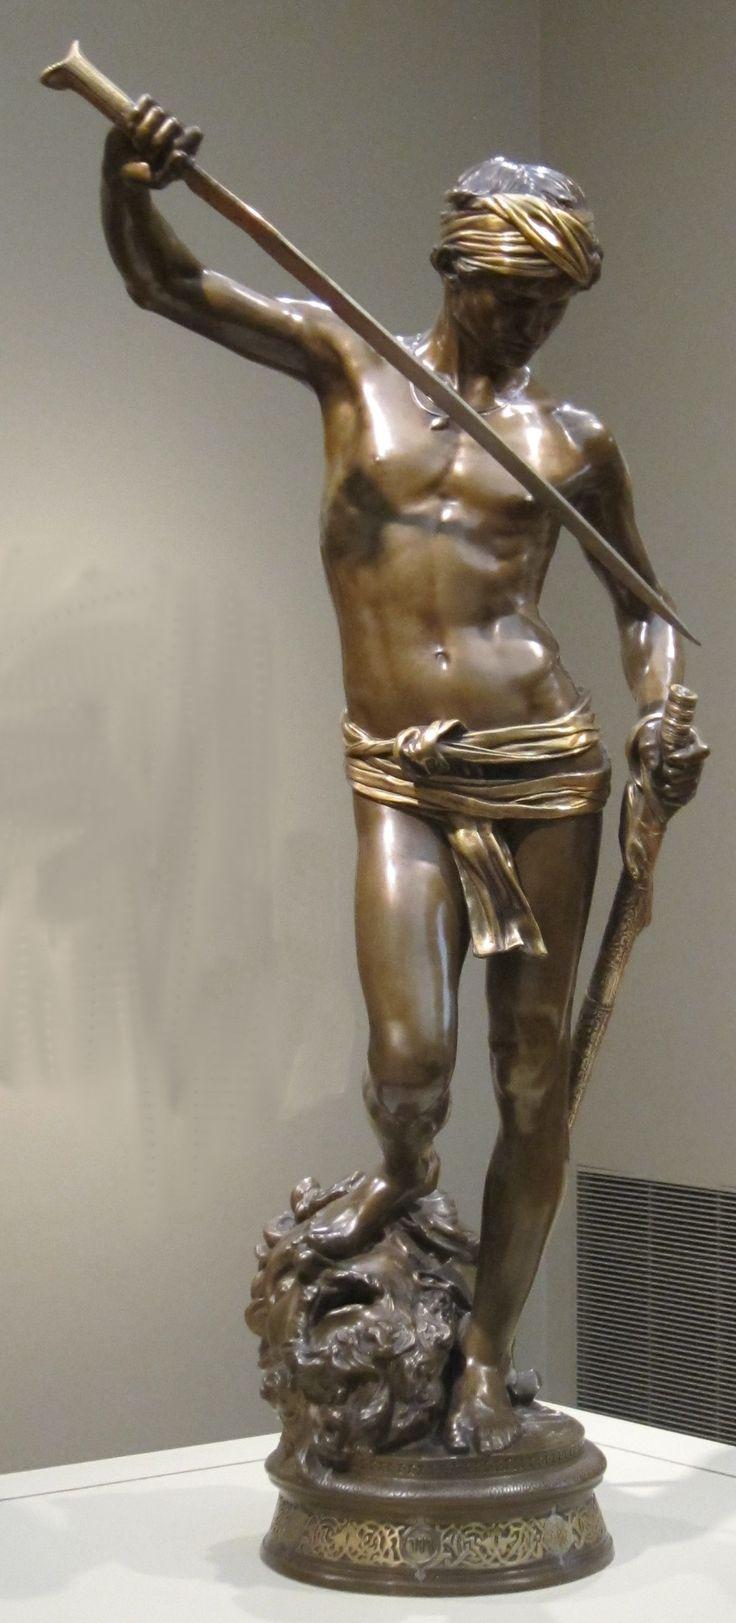 'David_with_the_Head_of_Goliath'_by_Antonin_Mercié,_Cincinnati_Art_Museum.JPG (1240×2735)